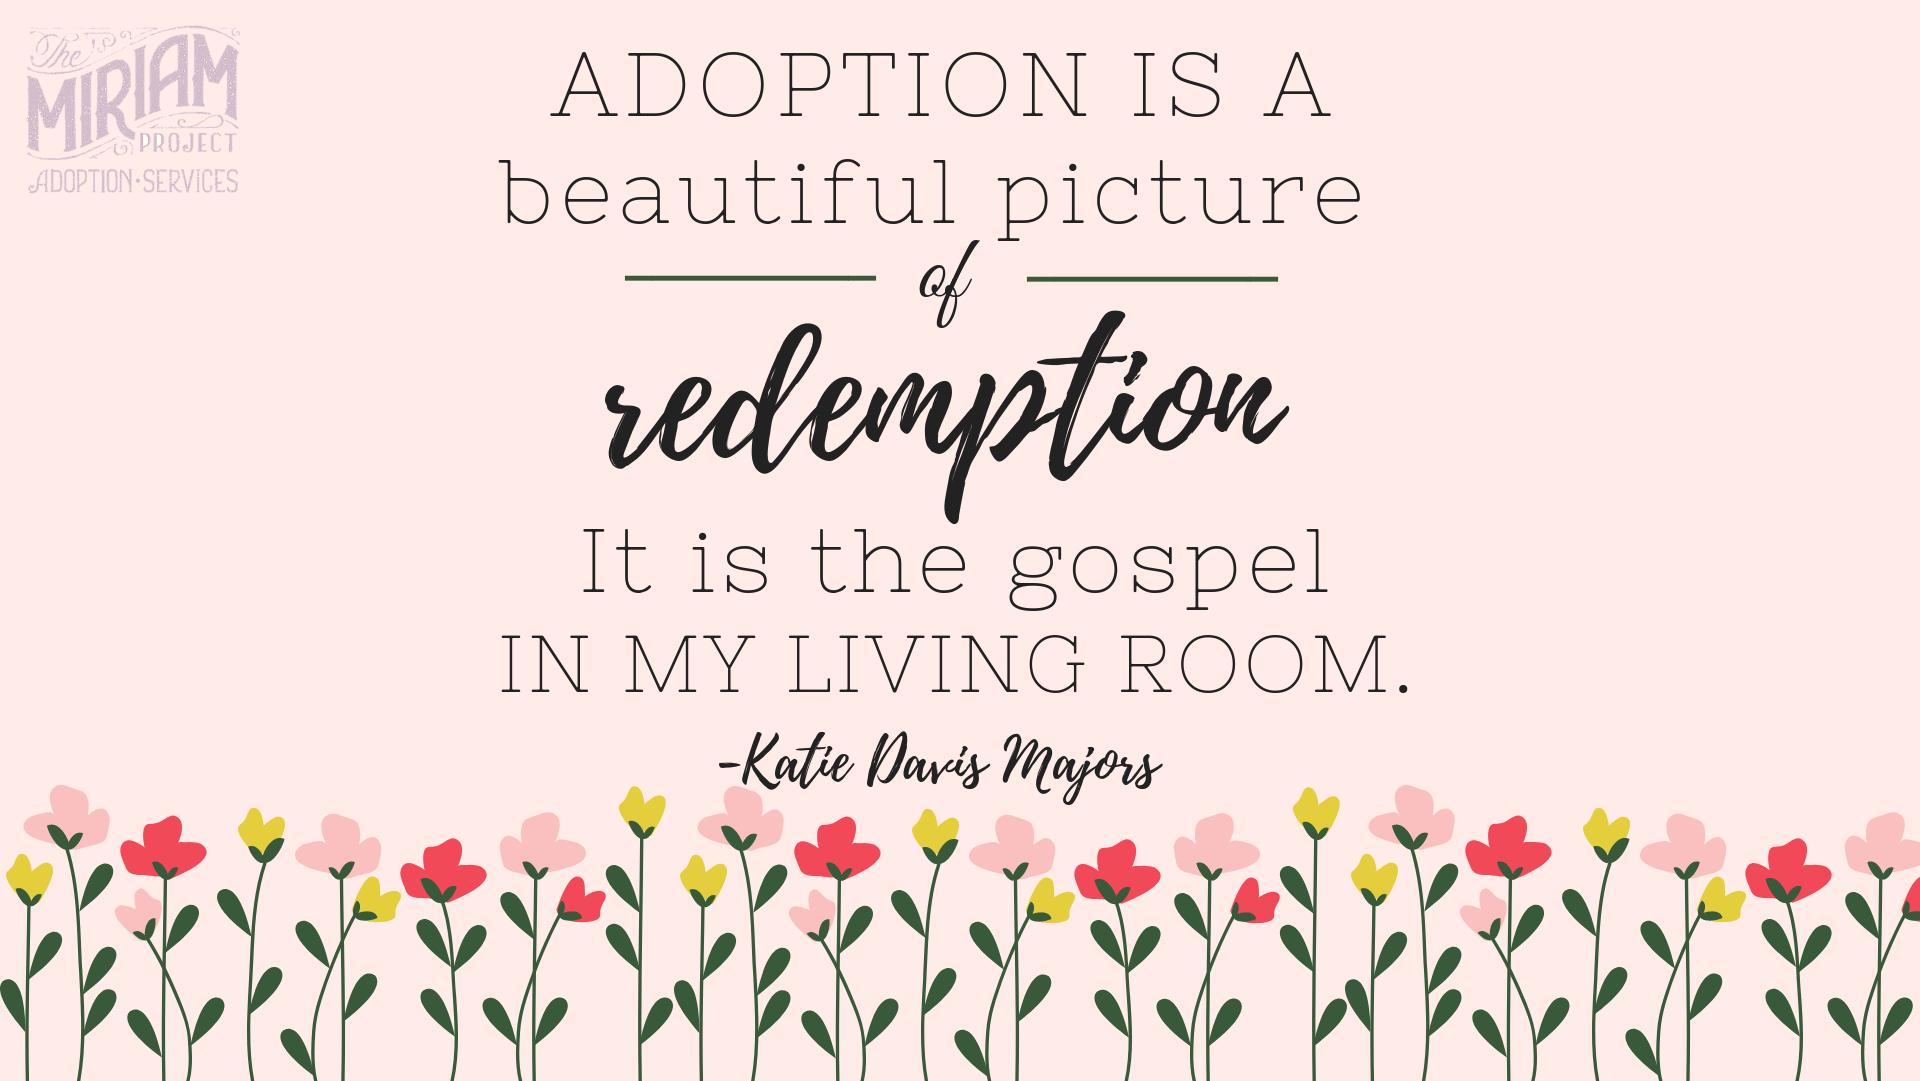 Desktop Wallpaper Nationaladoptionmonth Adoption Wallpaper National Adoption Month Adoption Adoption Agencies